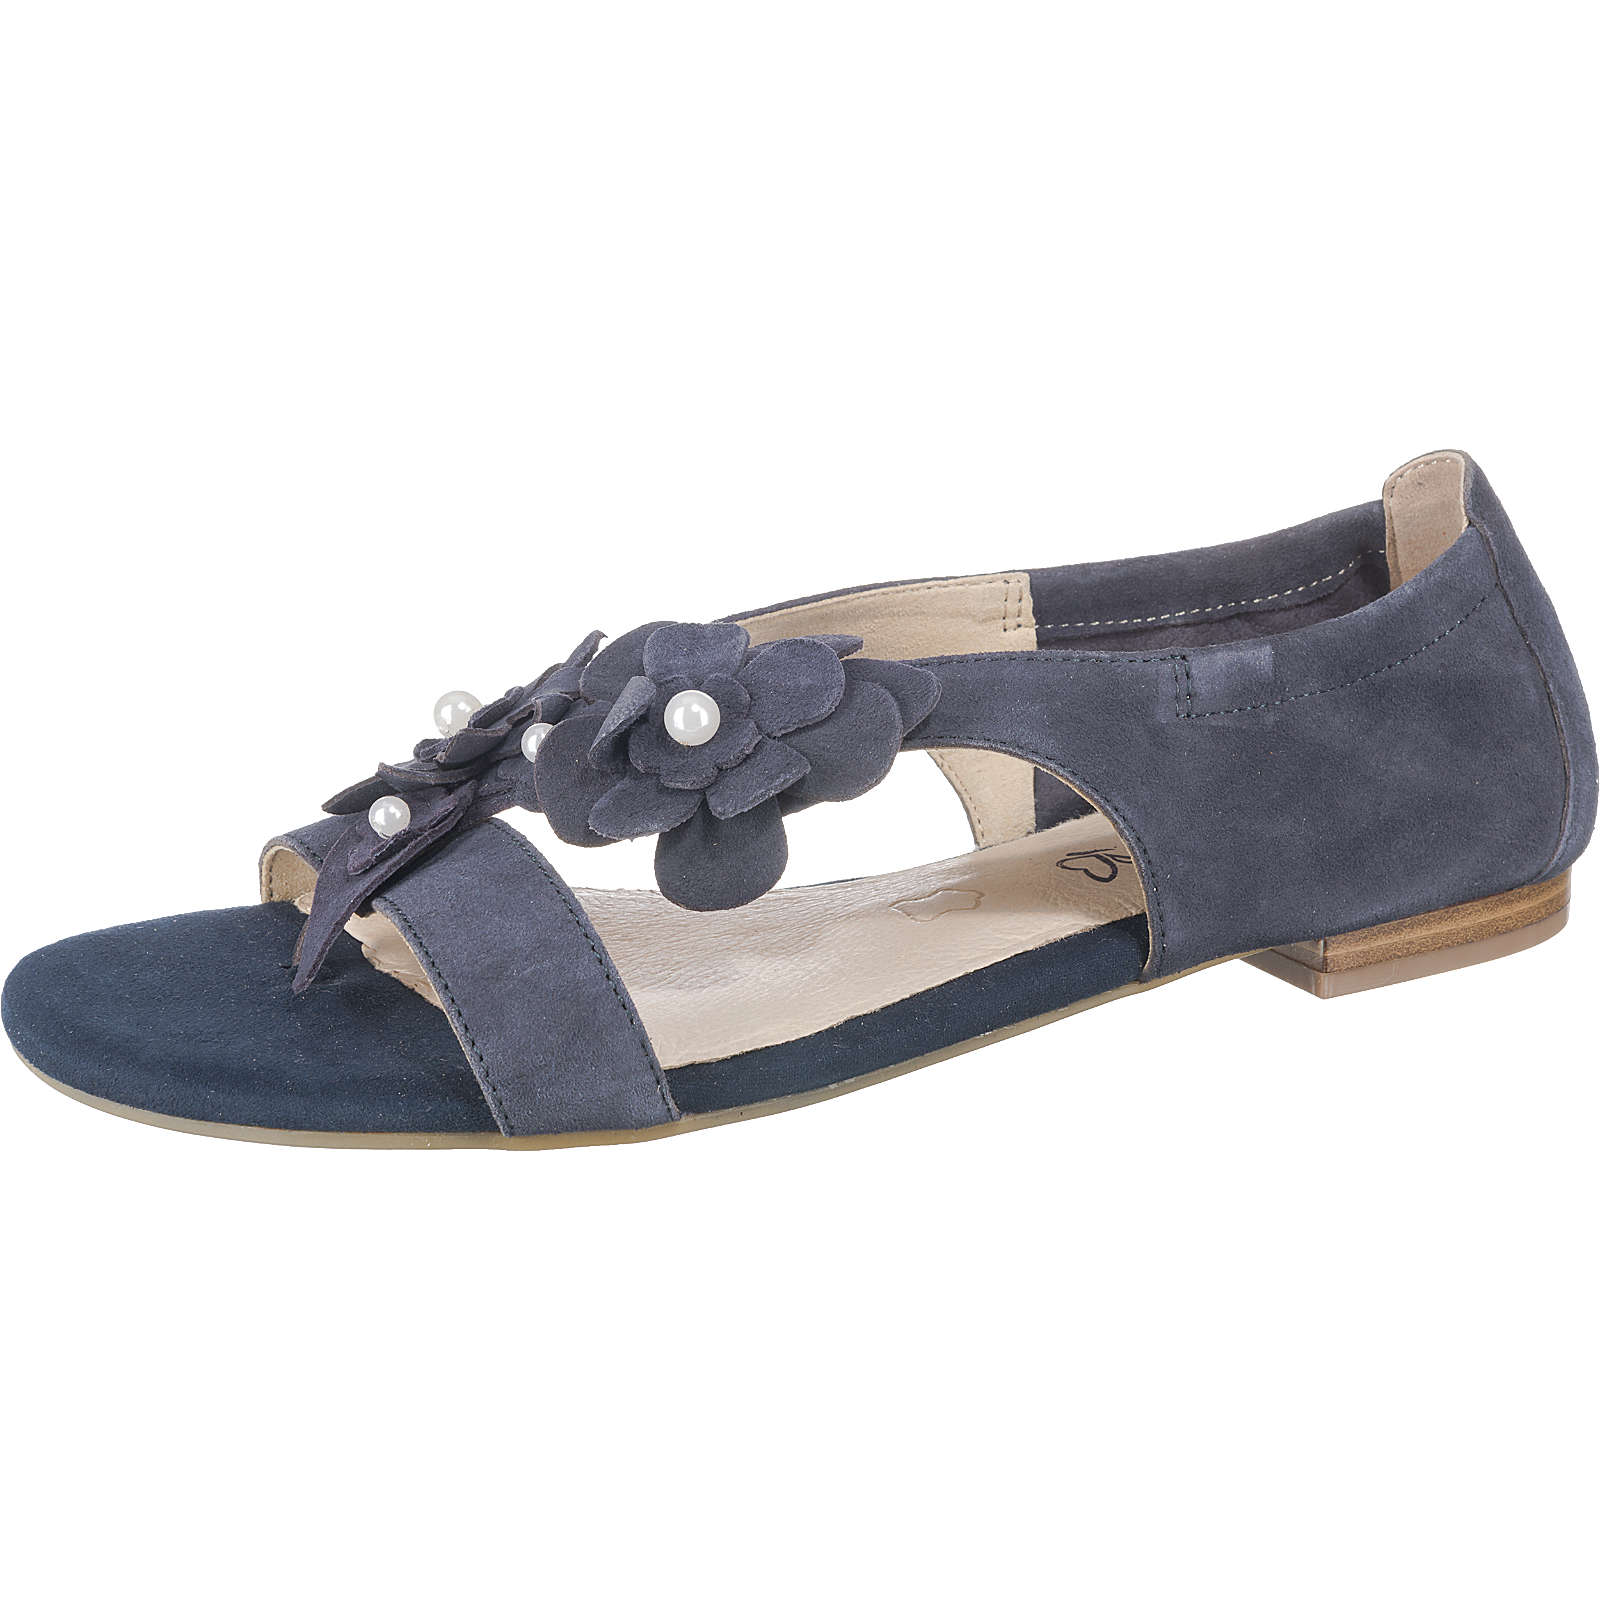 CAPRICE Komfort-Sandalen blau Damen Gr. 36